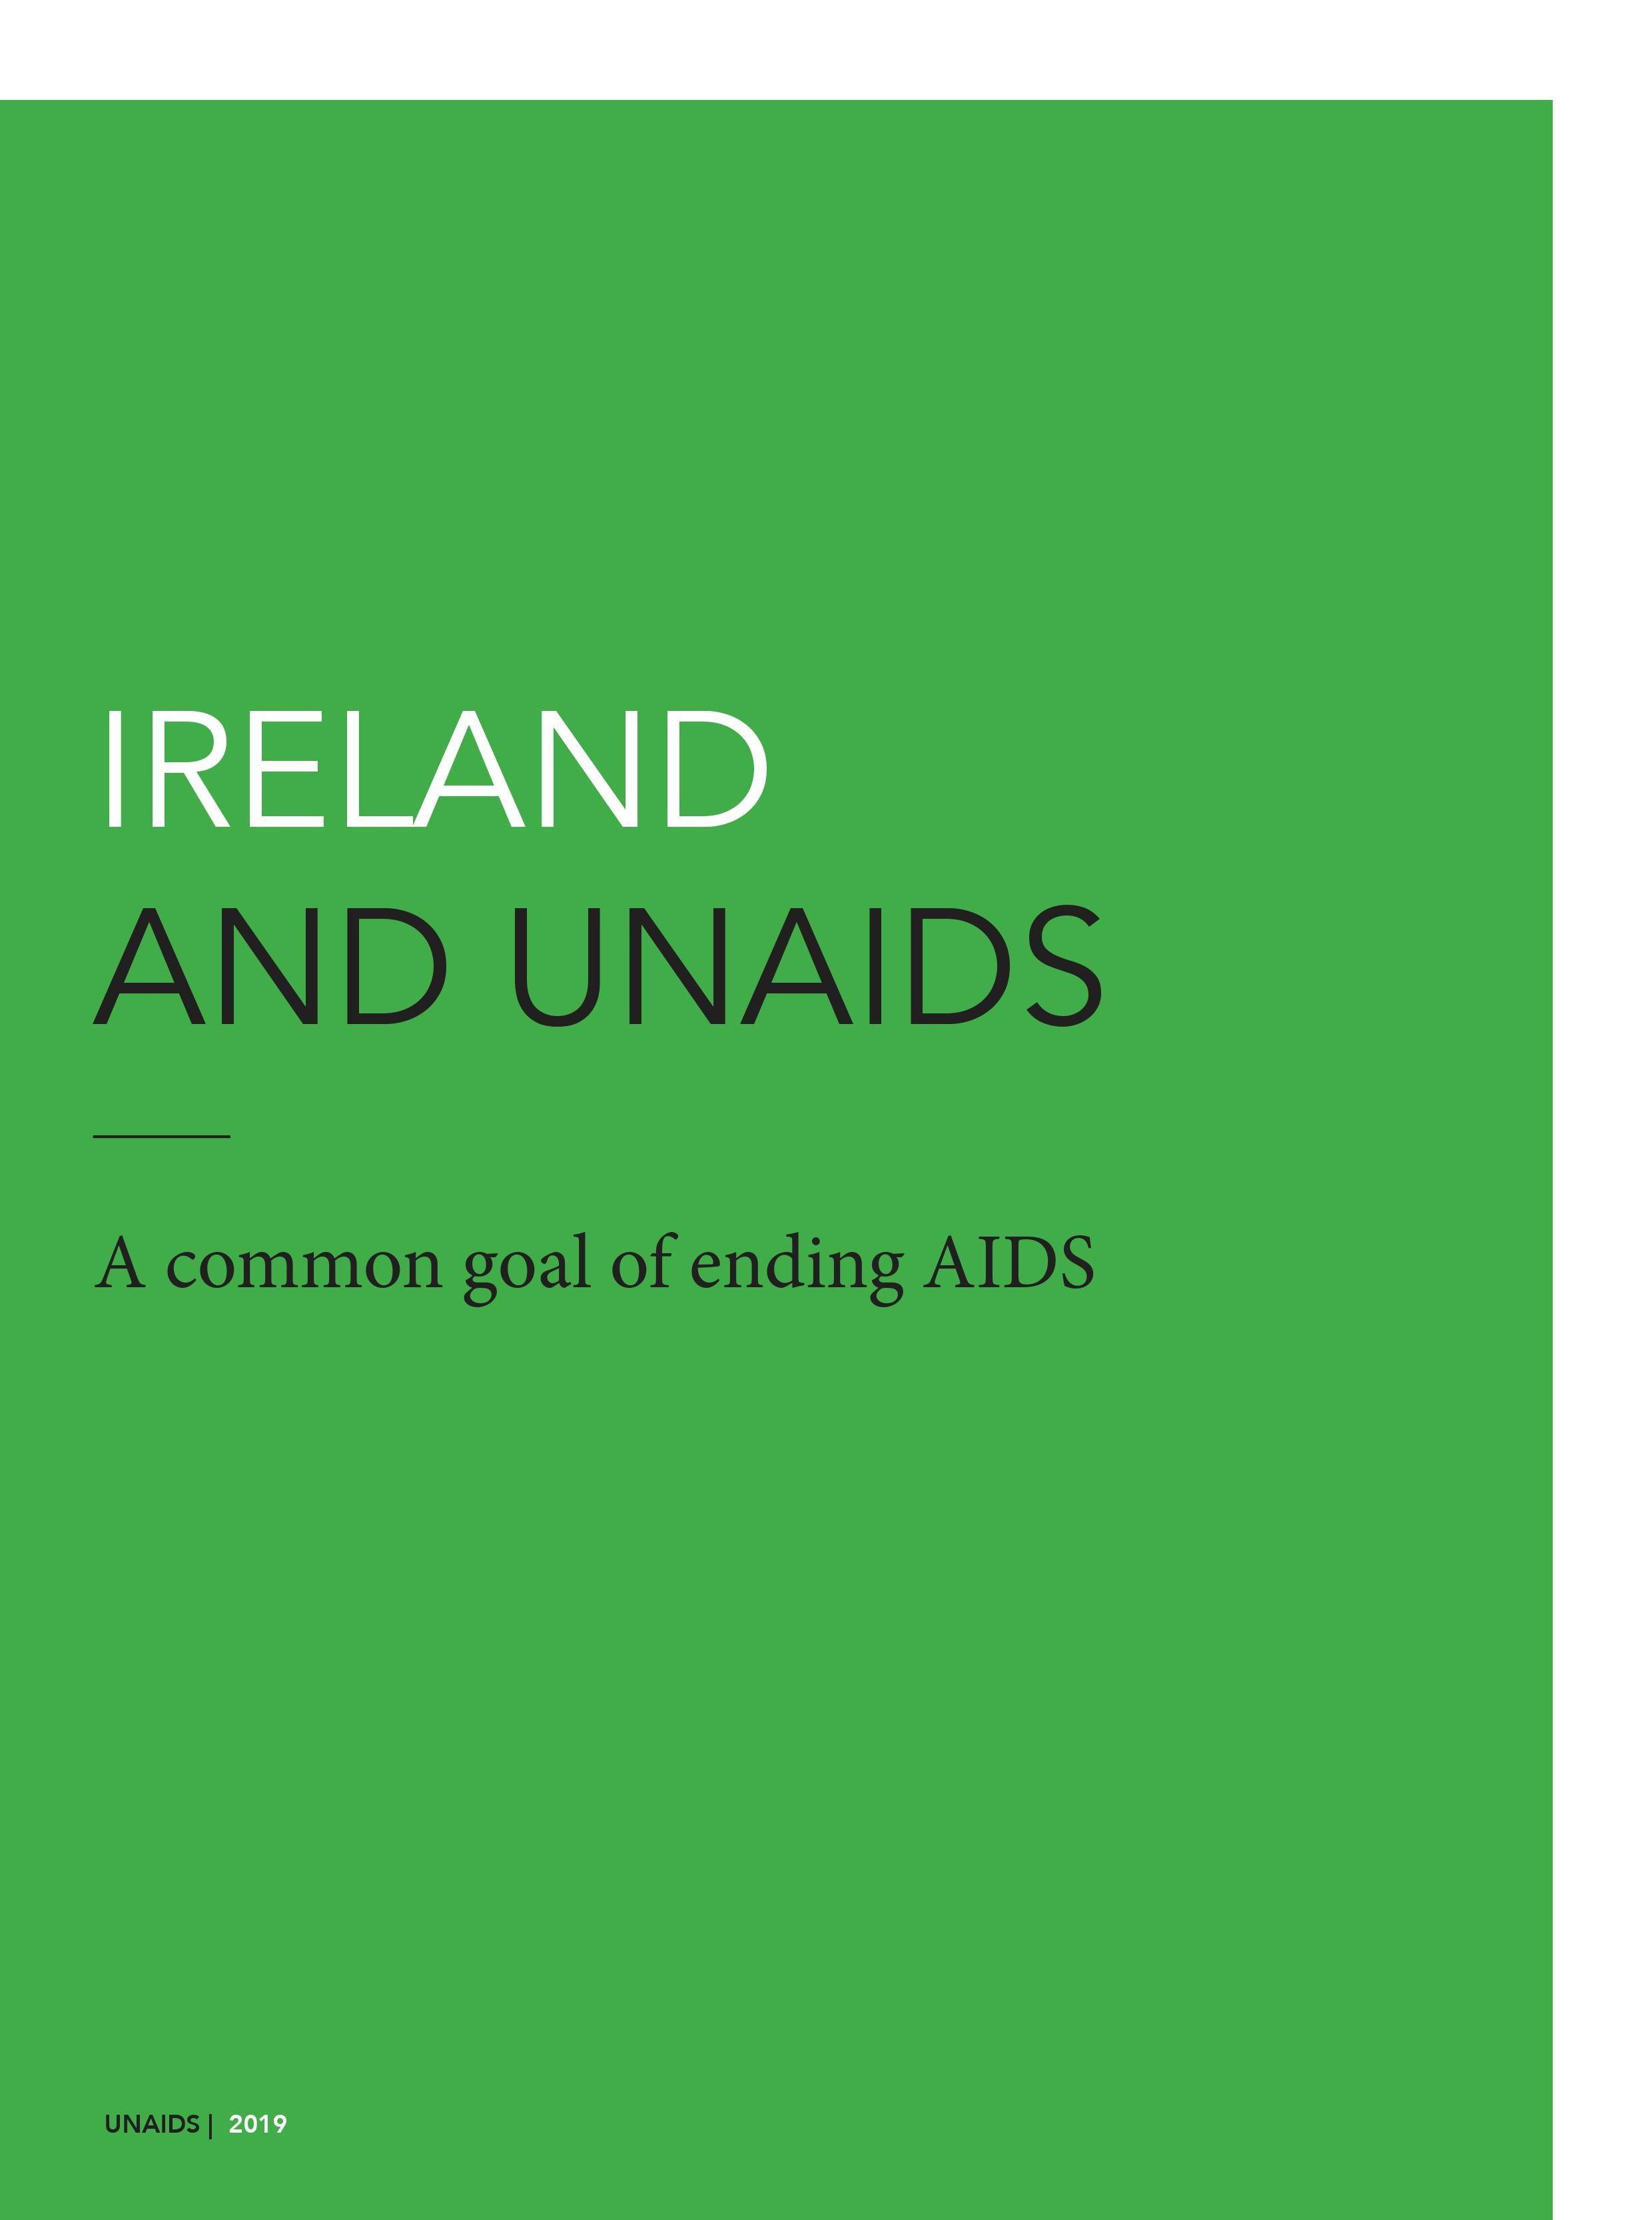 Ireland and UNAIDS